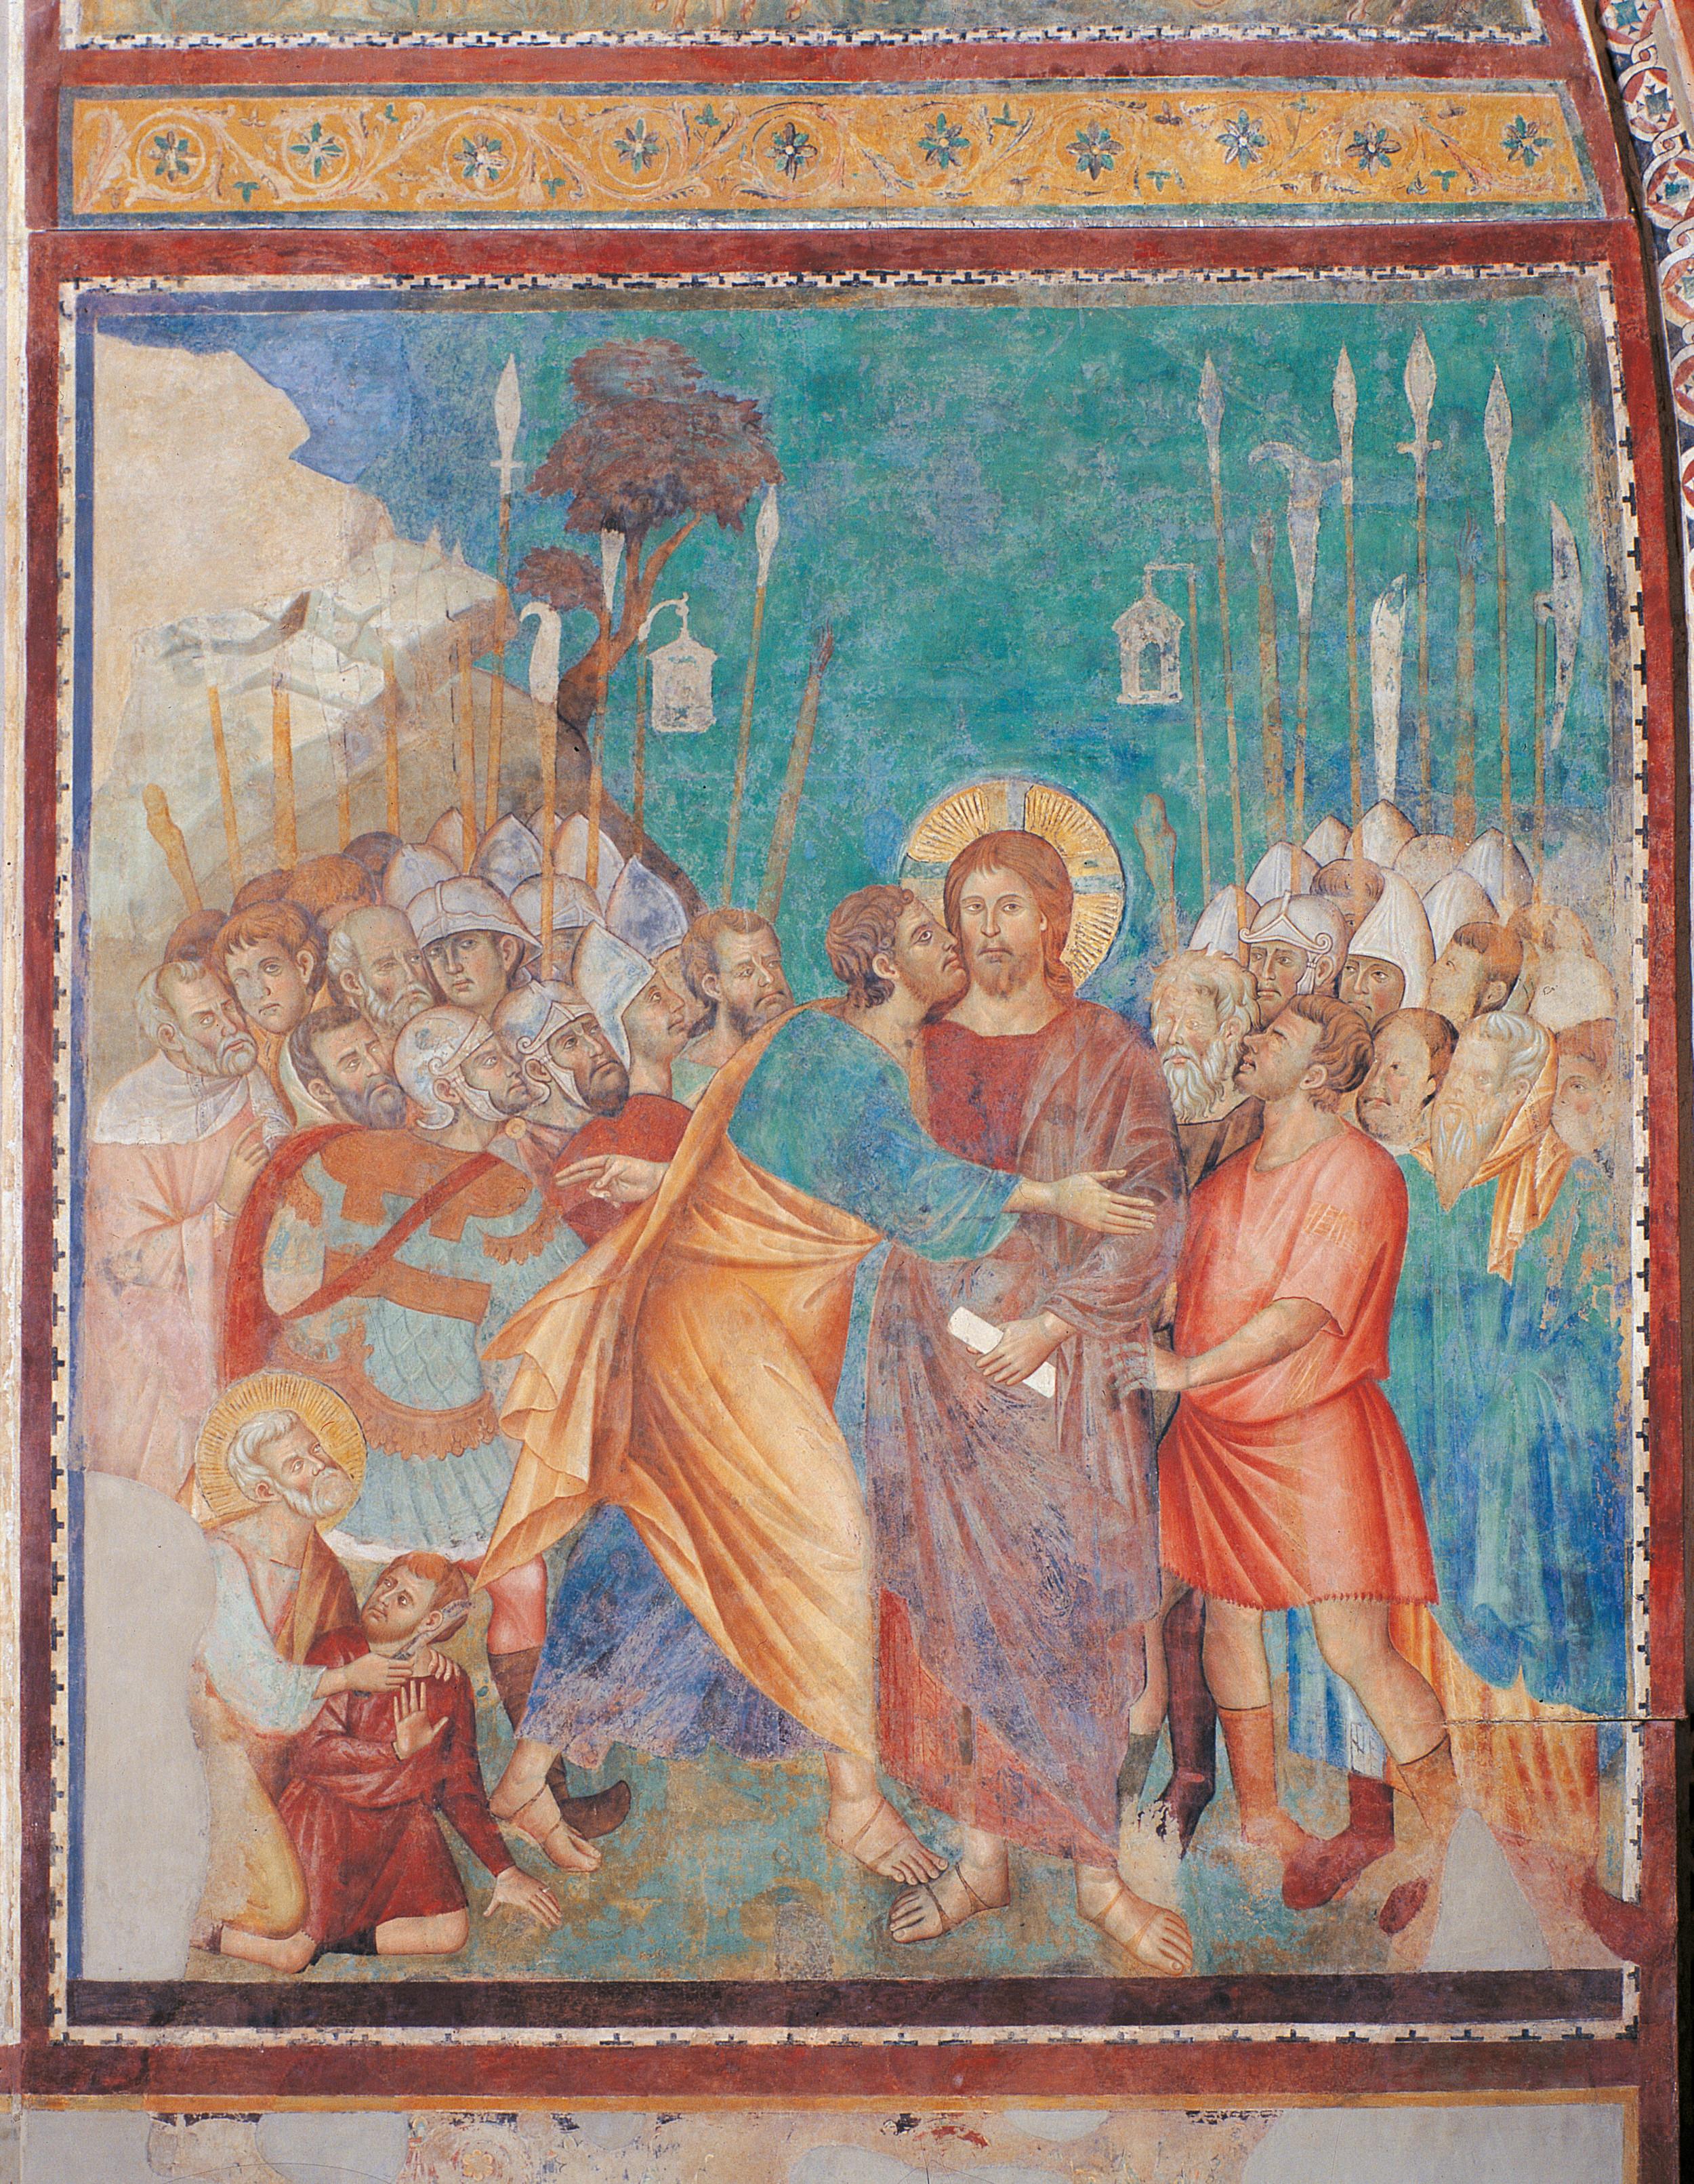 Jesus Helping Woman Painting Art